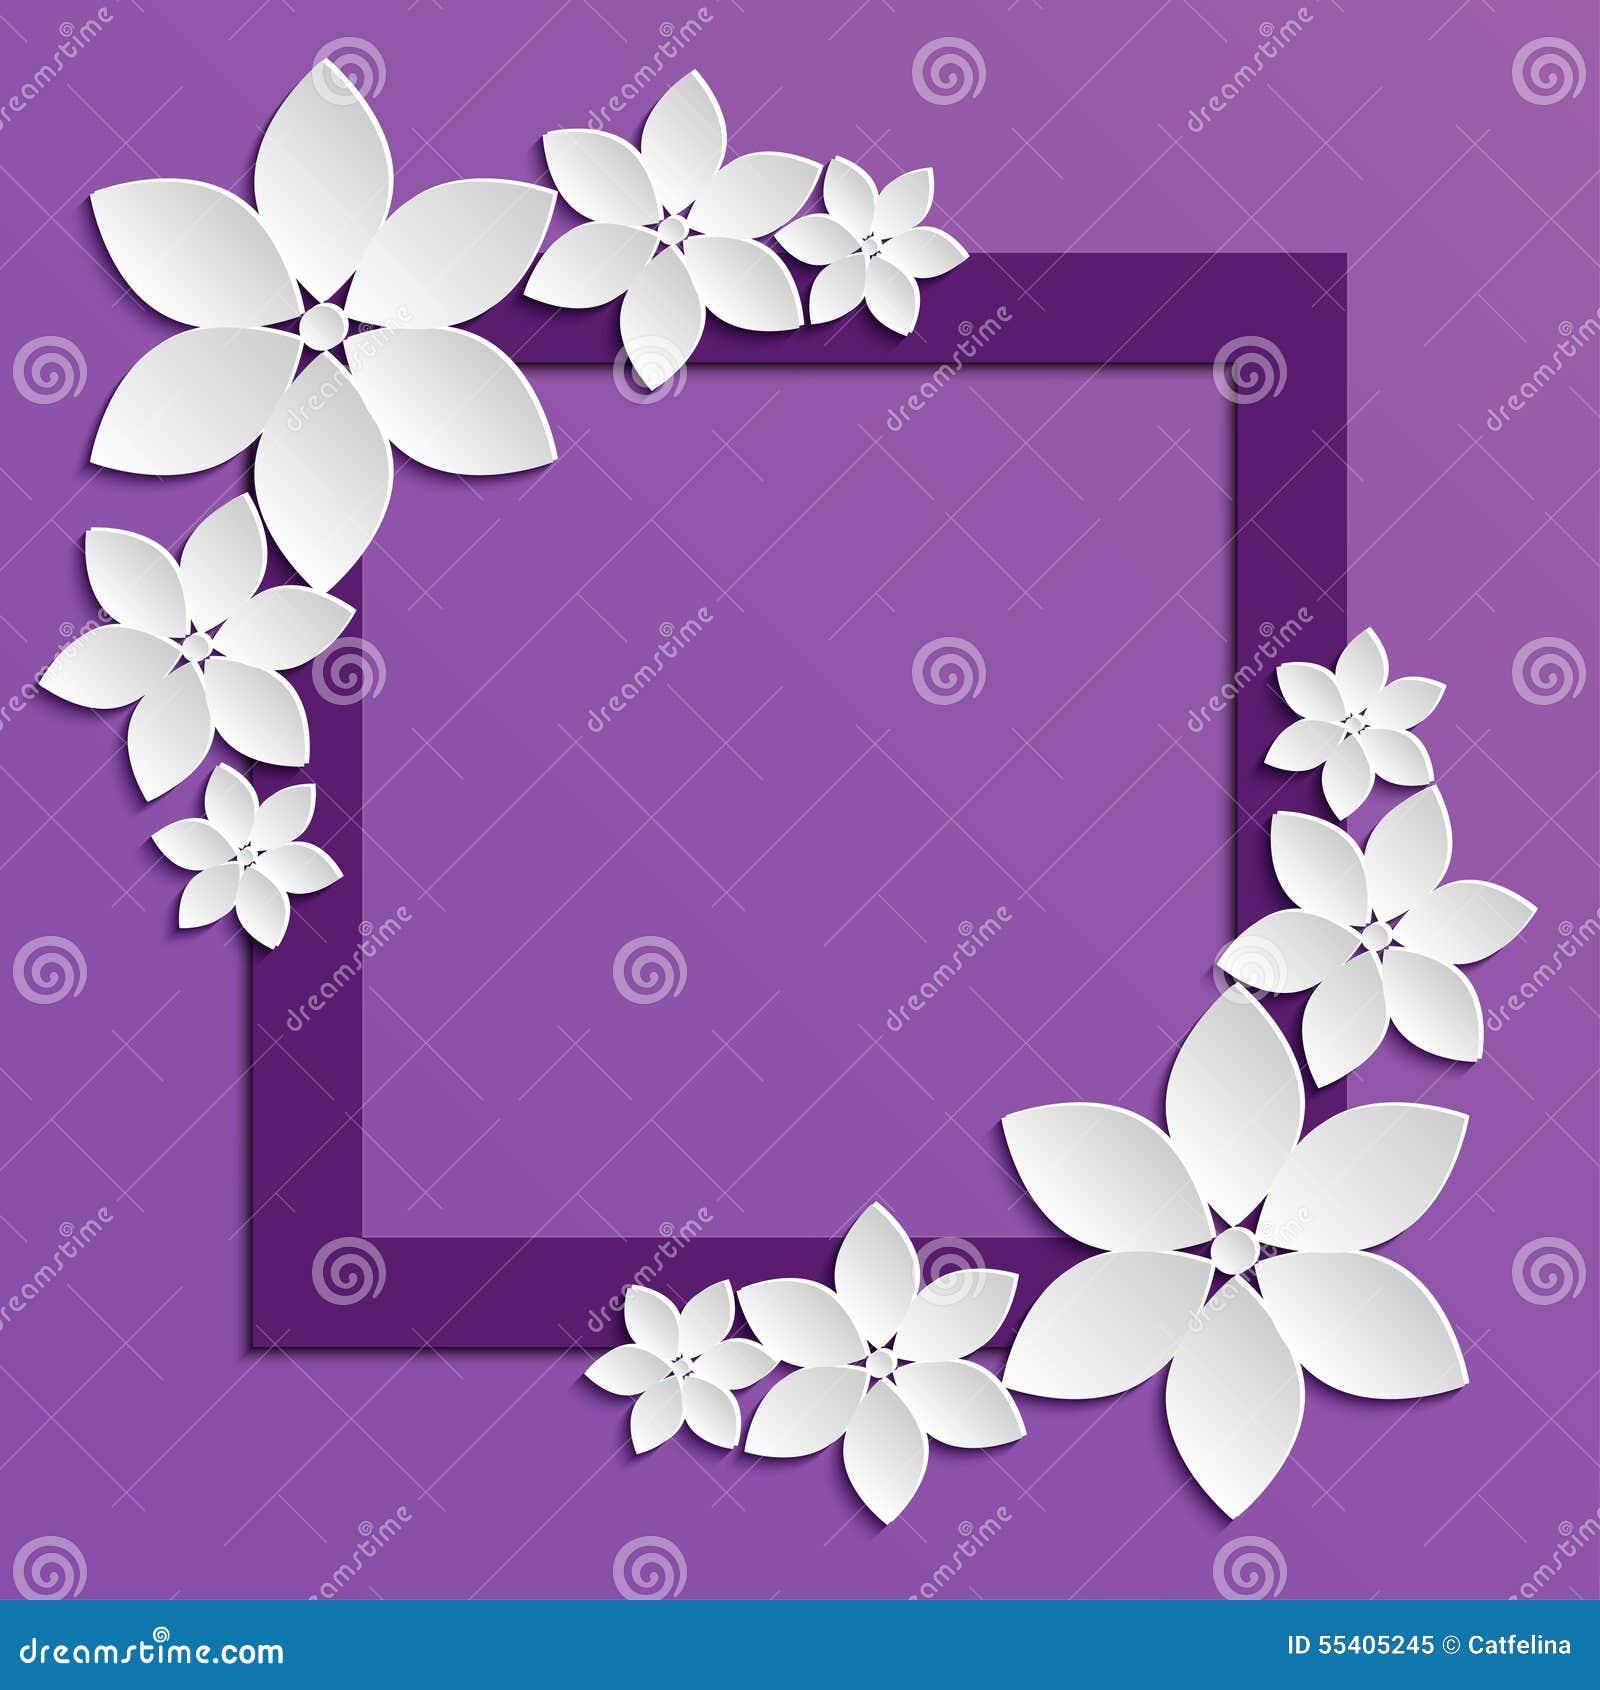 Decorative Paper Border Designs Decoration For Home